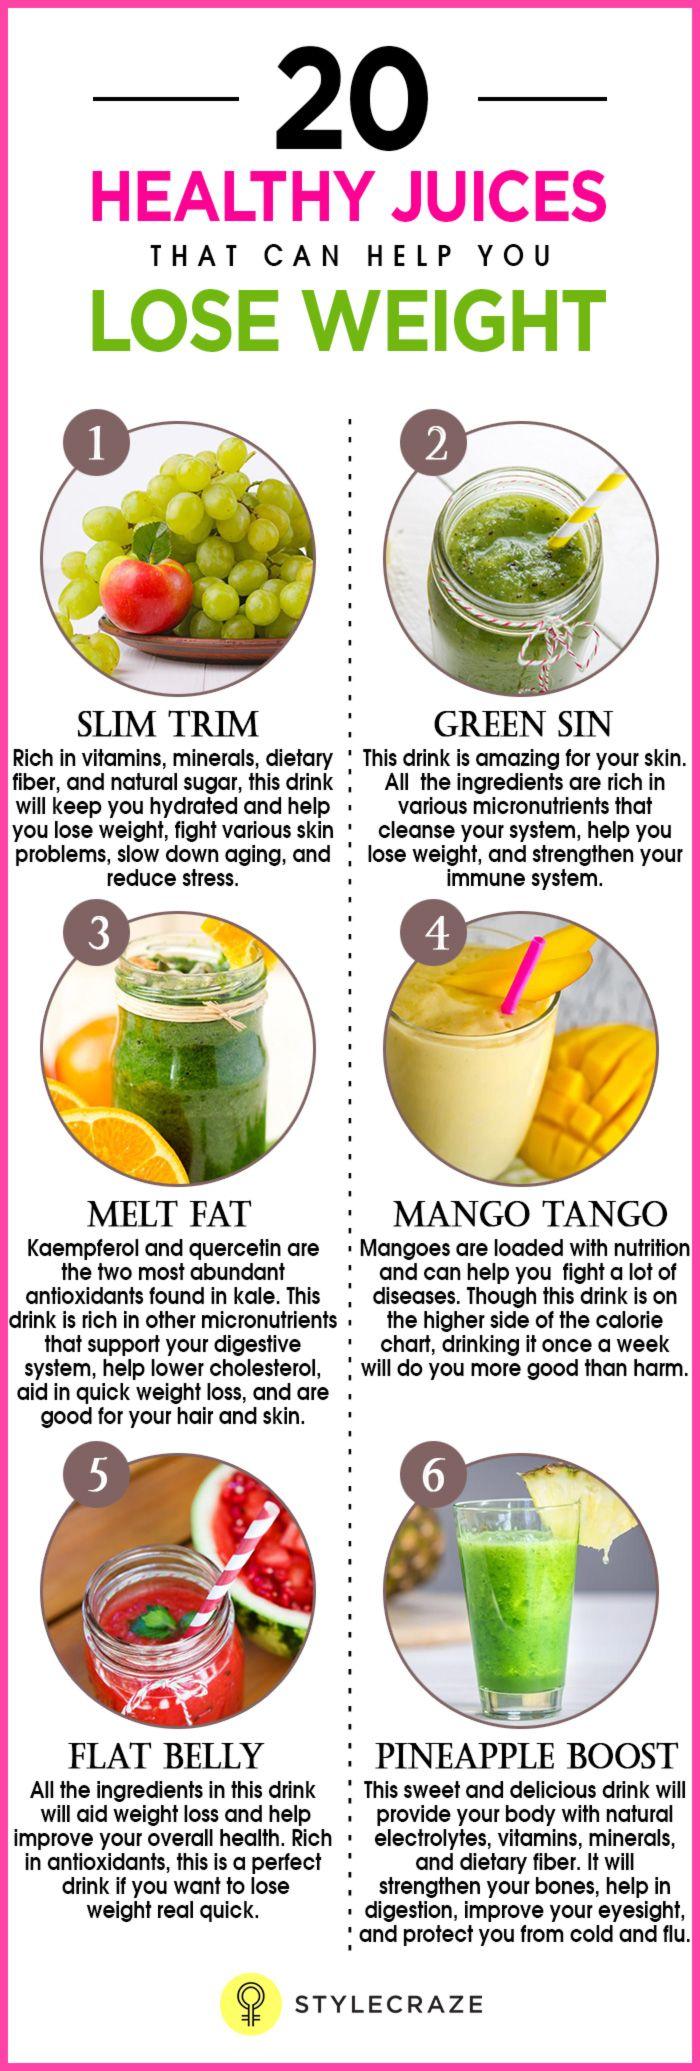 best way to lose weight on amitriptyline